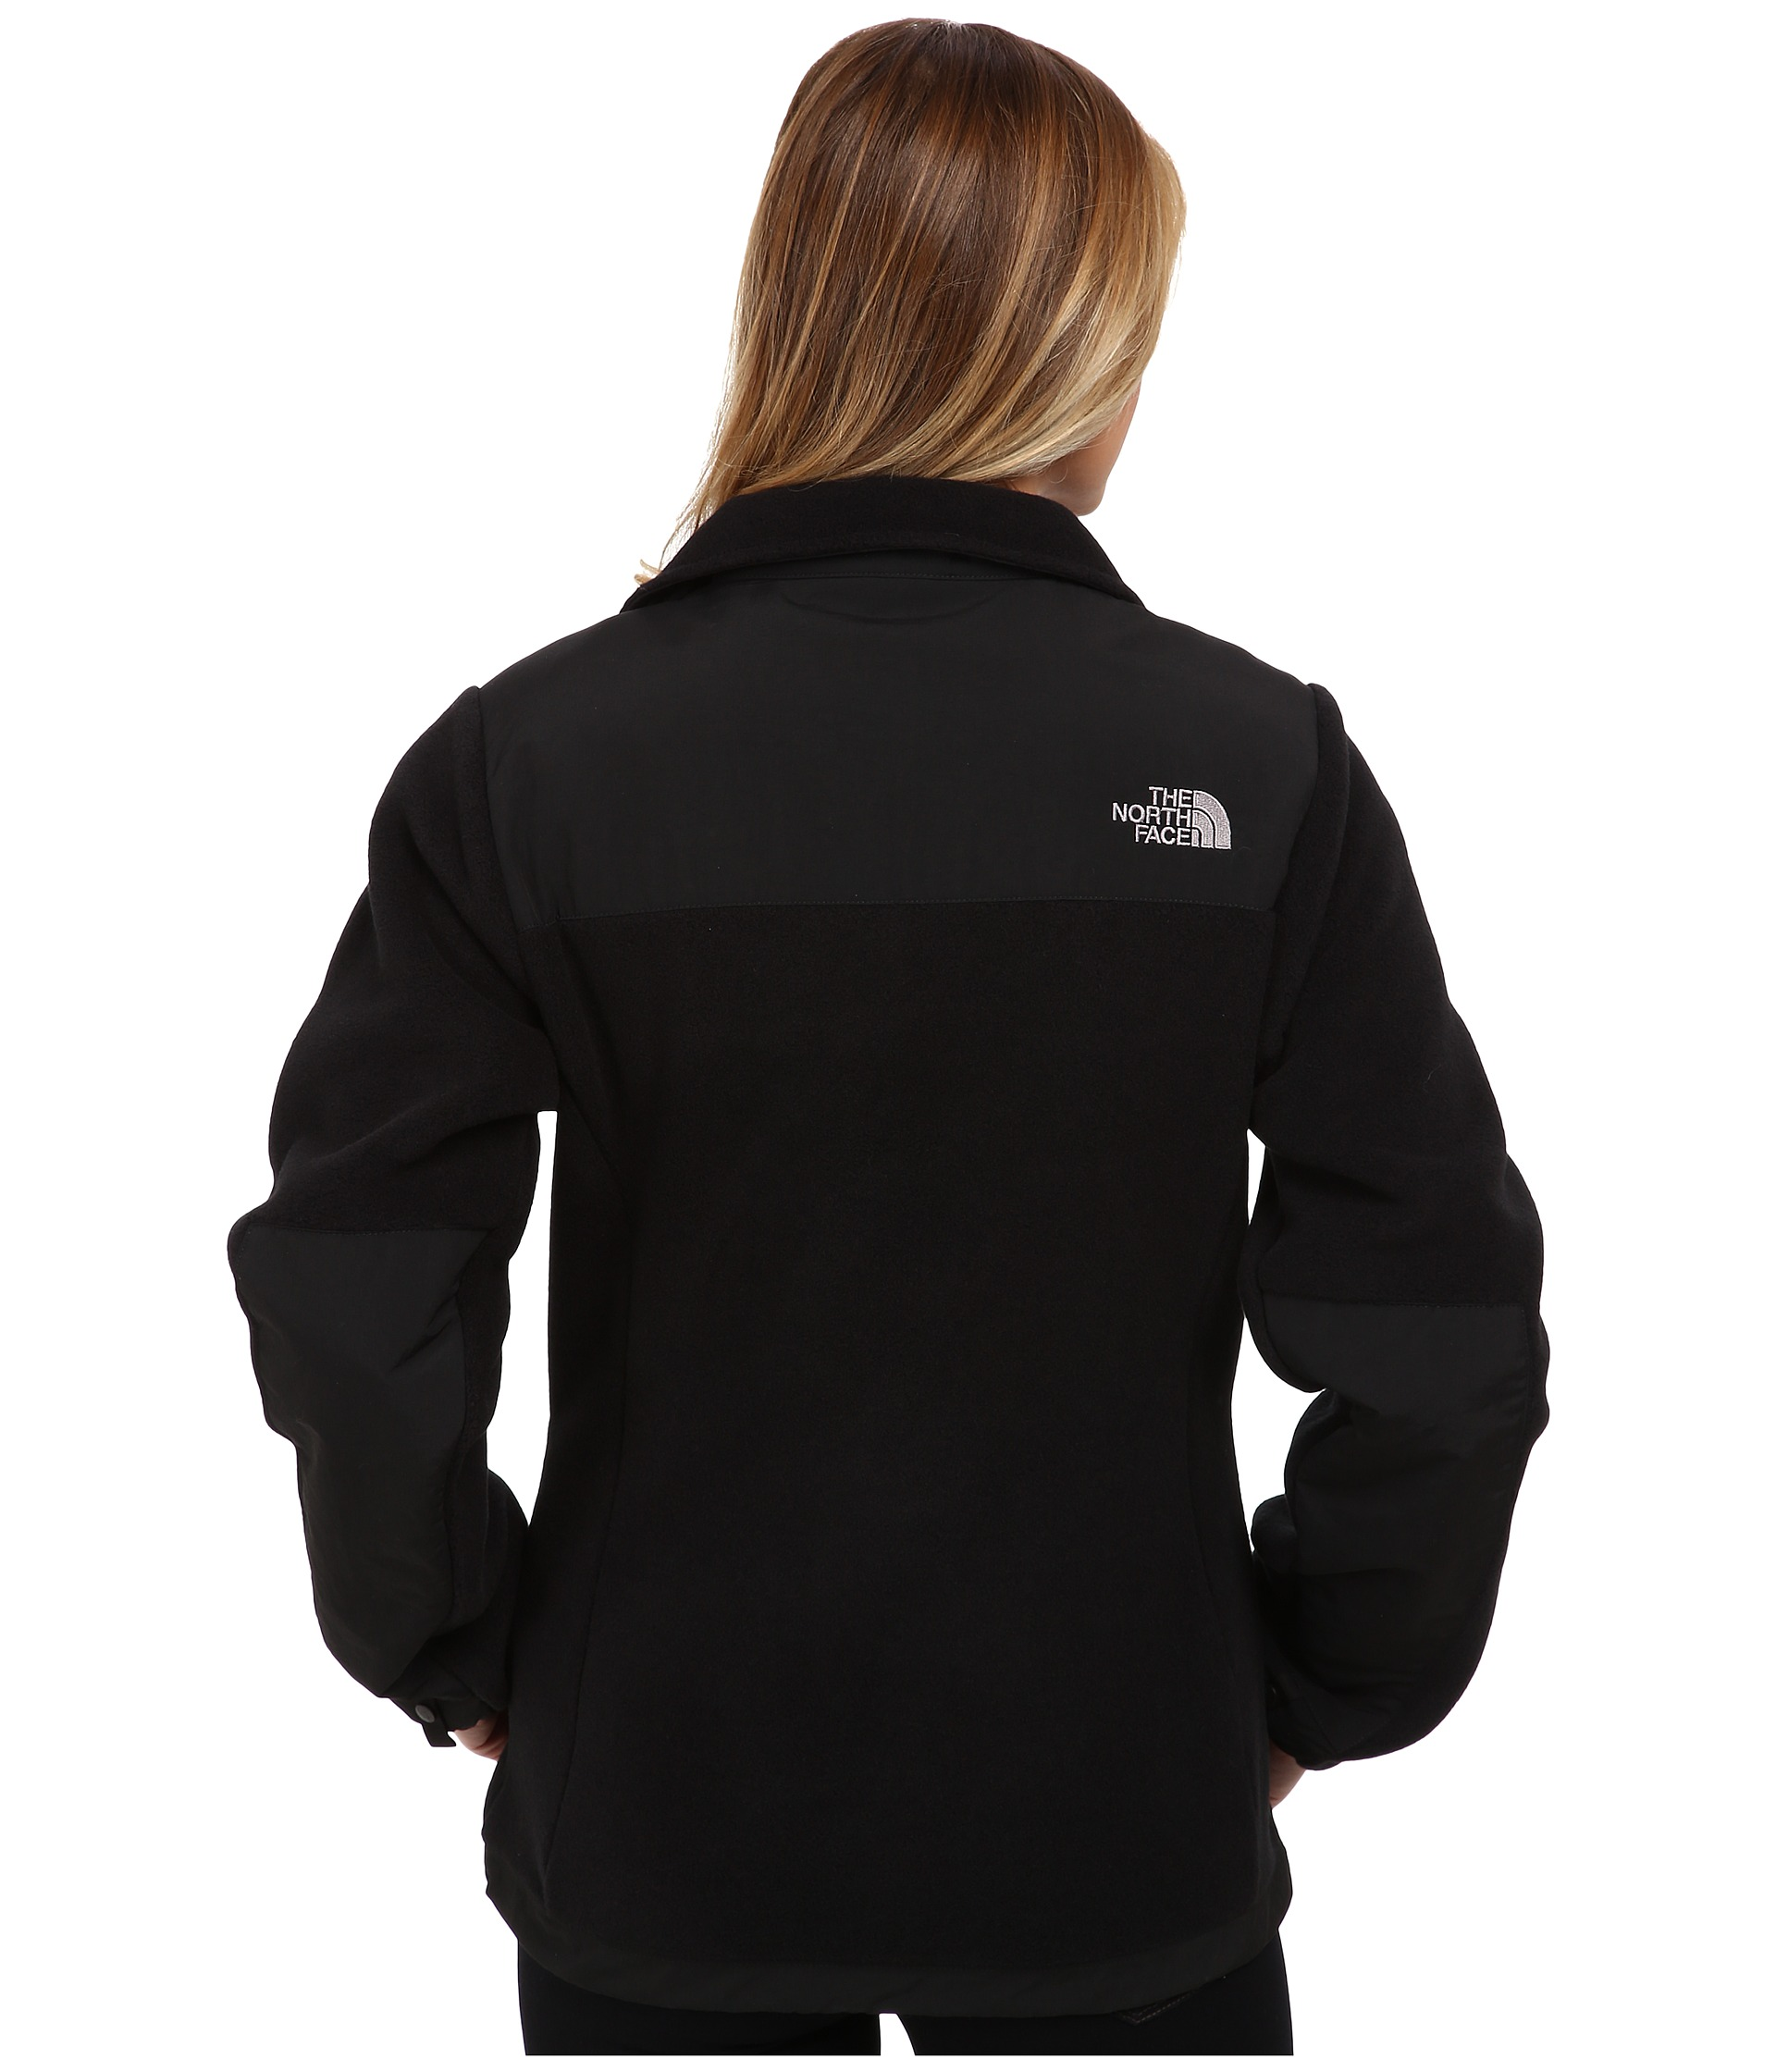 North face denali hoodie jacket